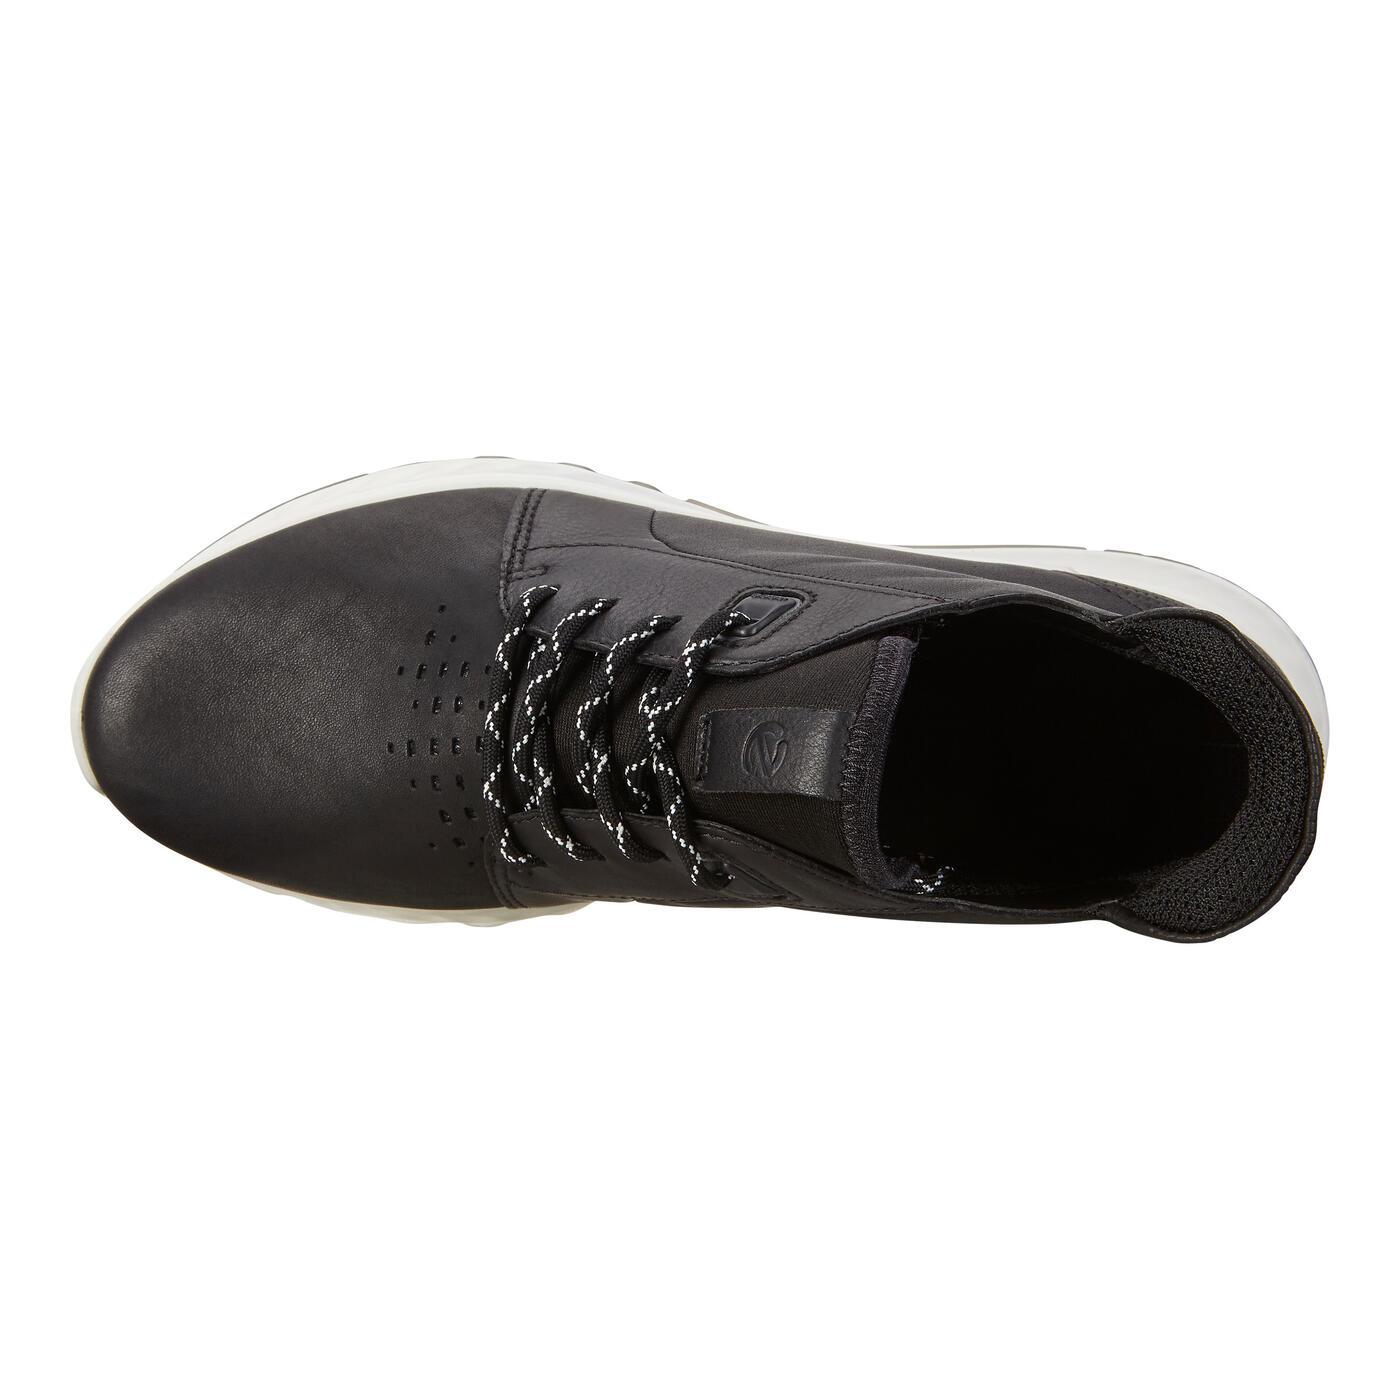 ECCO ST1 Womens High Cut Sneaker Lace